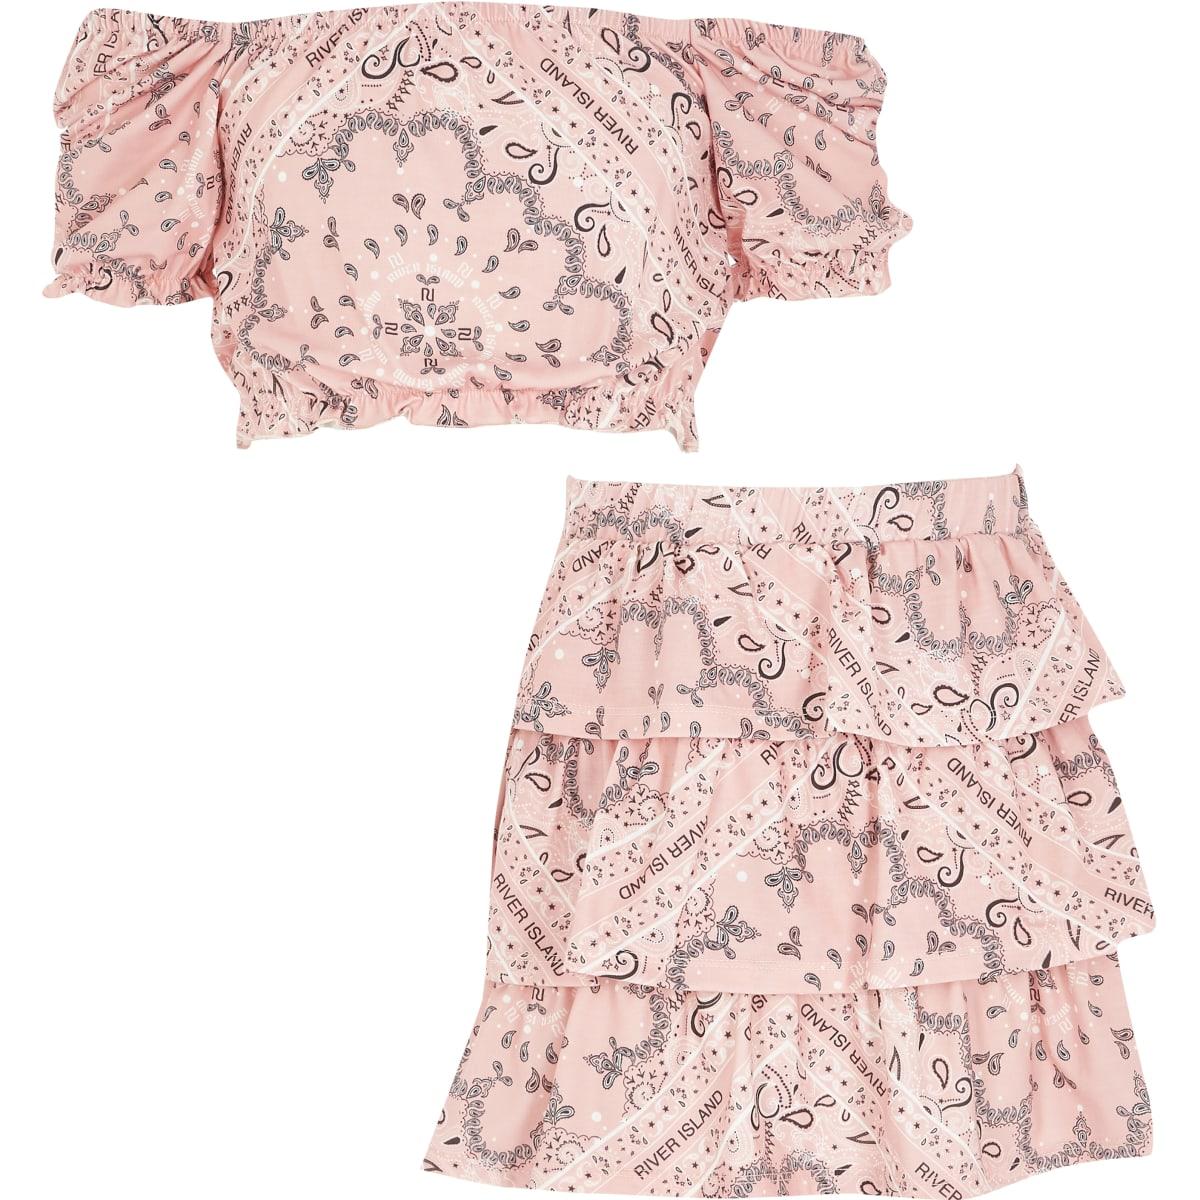 Girls pink bandana print rara skirt outfit